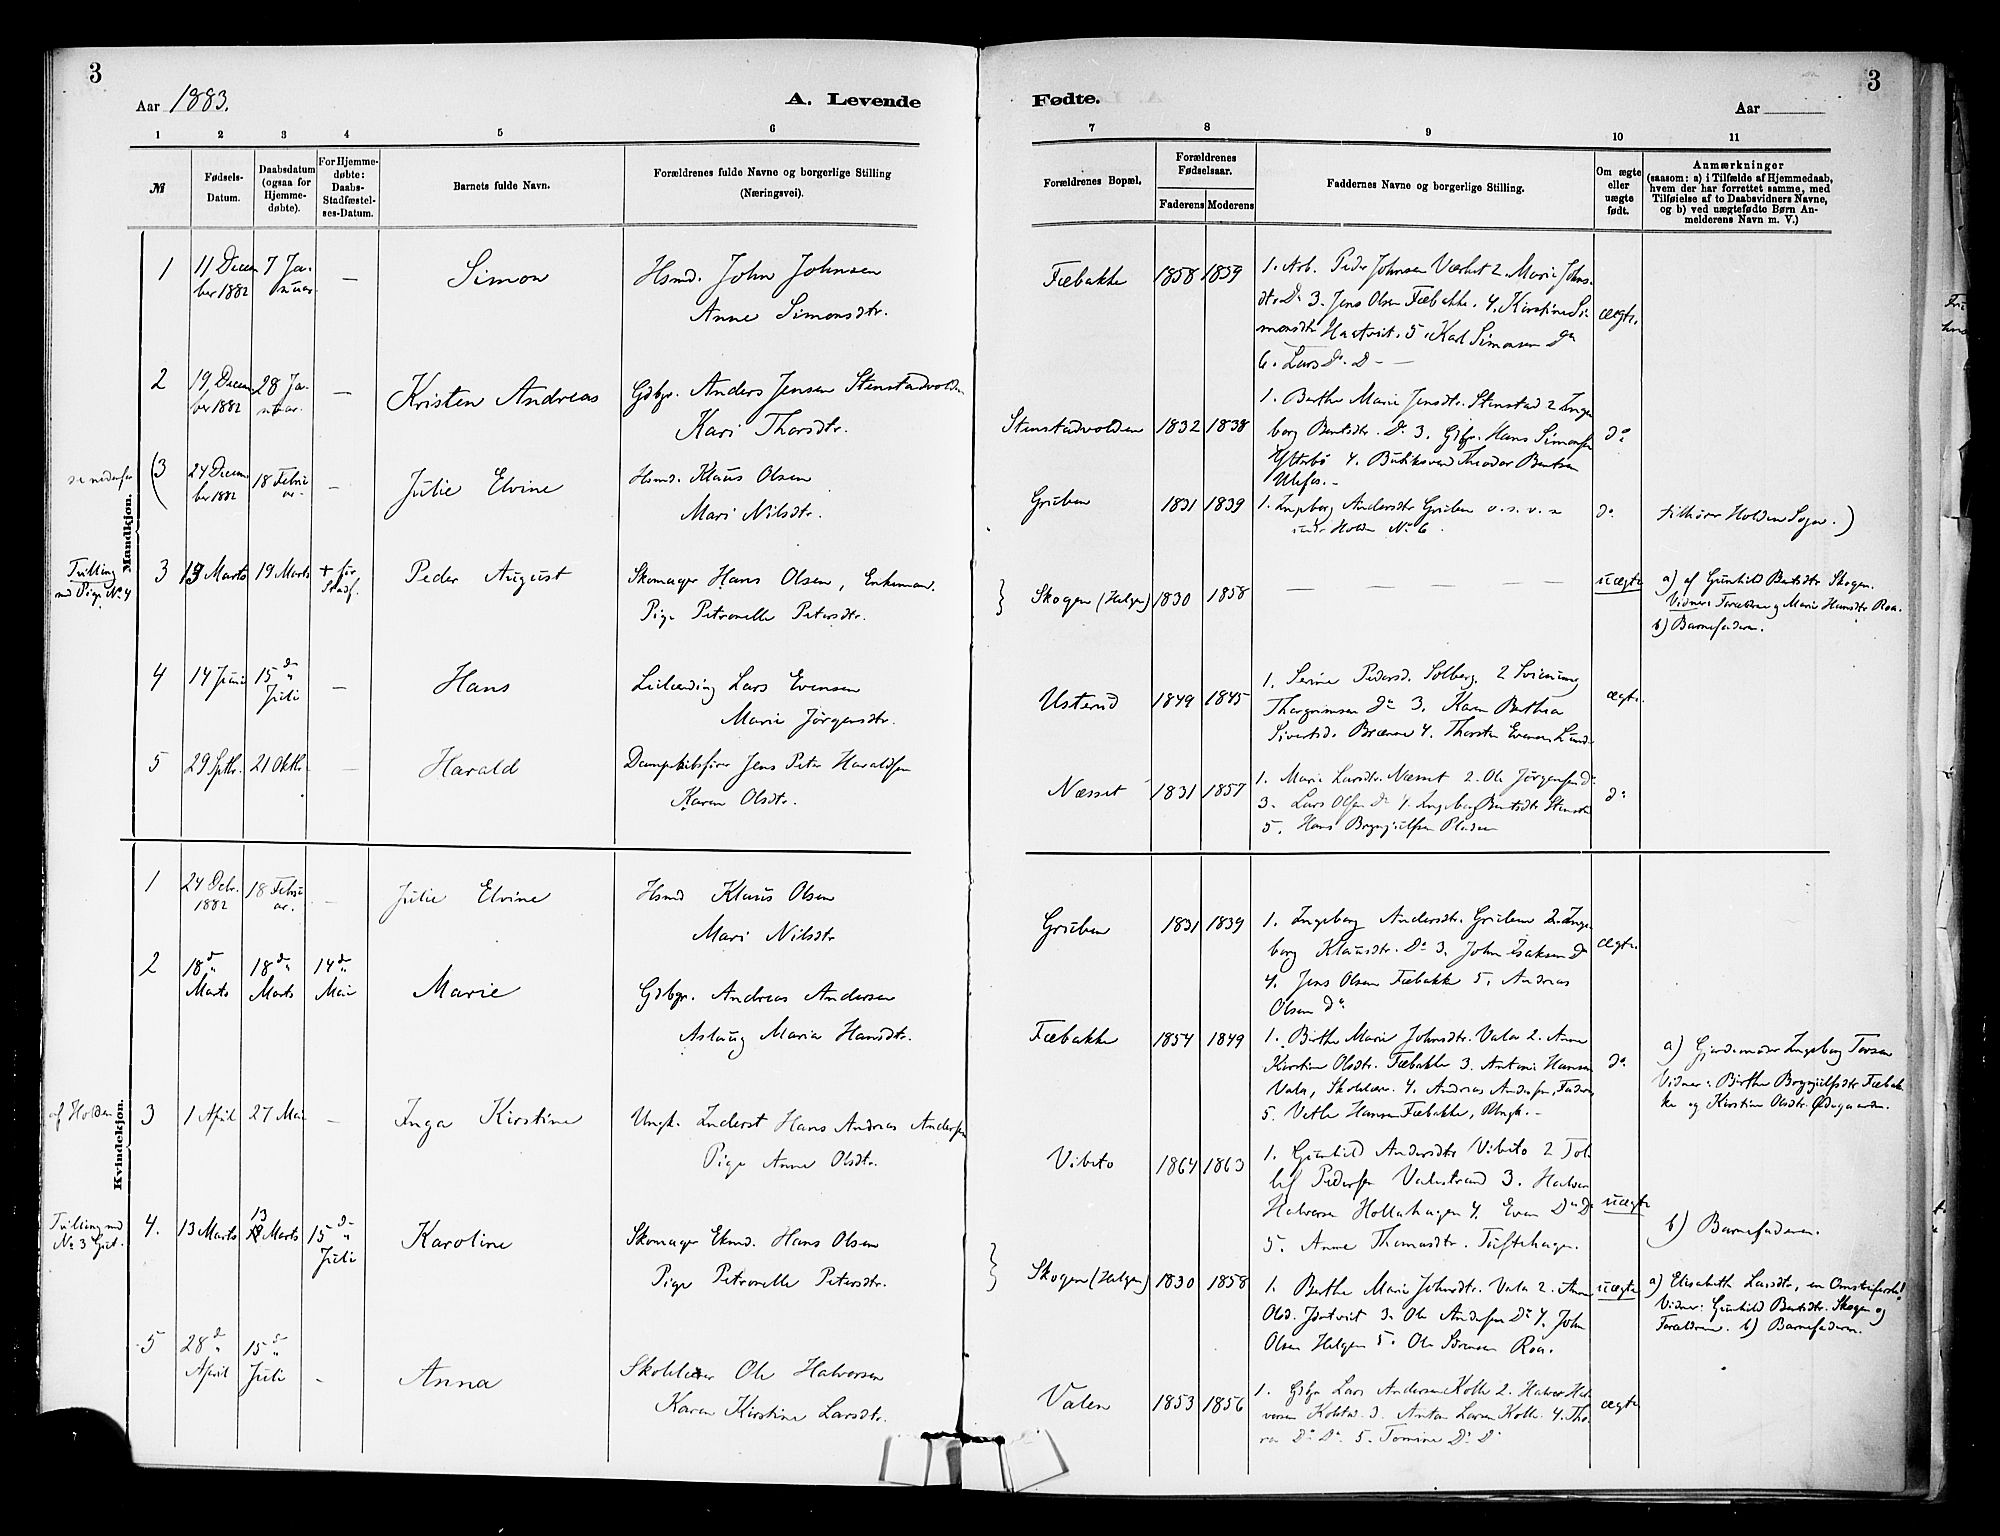 SAKO, Holla kirkebøker, F/Fa/L0009: Ministerialbok nr. 9, 1881-1897, s. 3